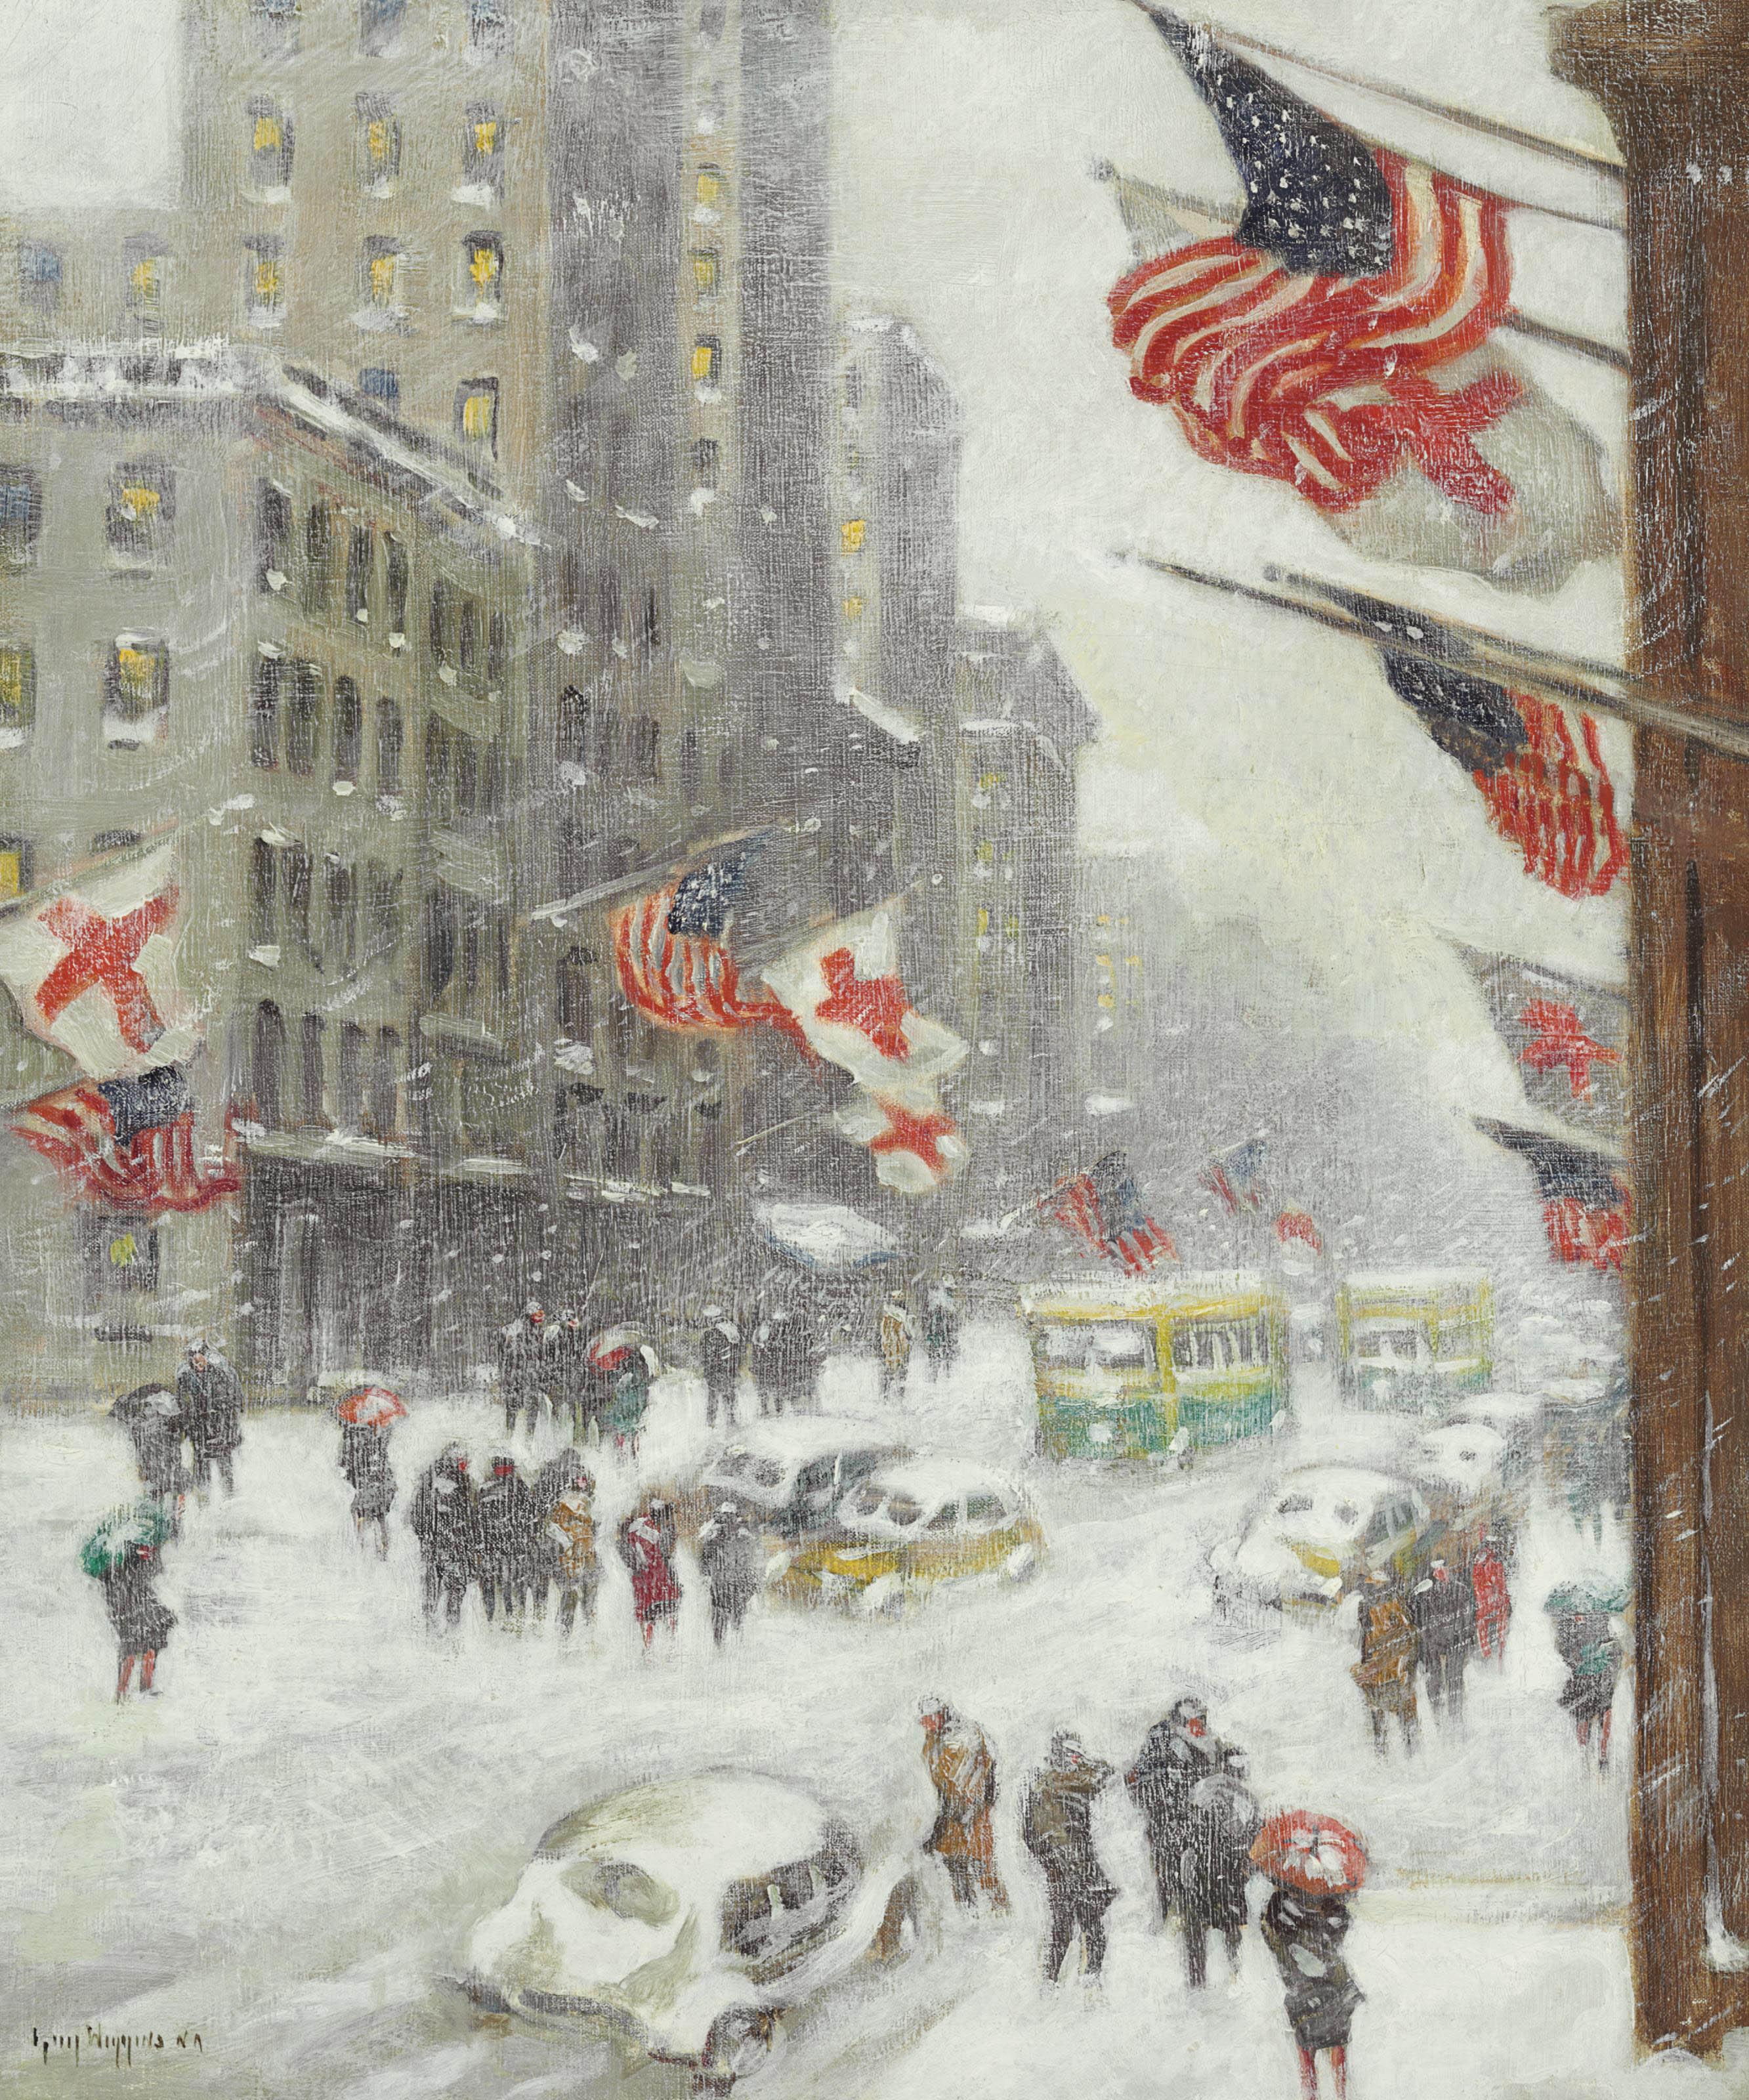 Fifth Avenue in Wartime